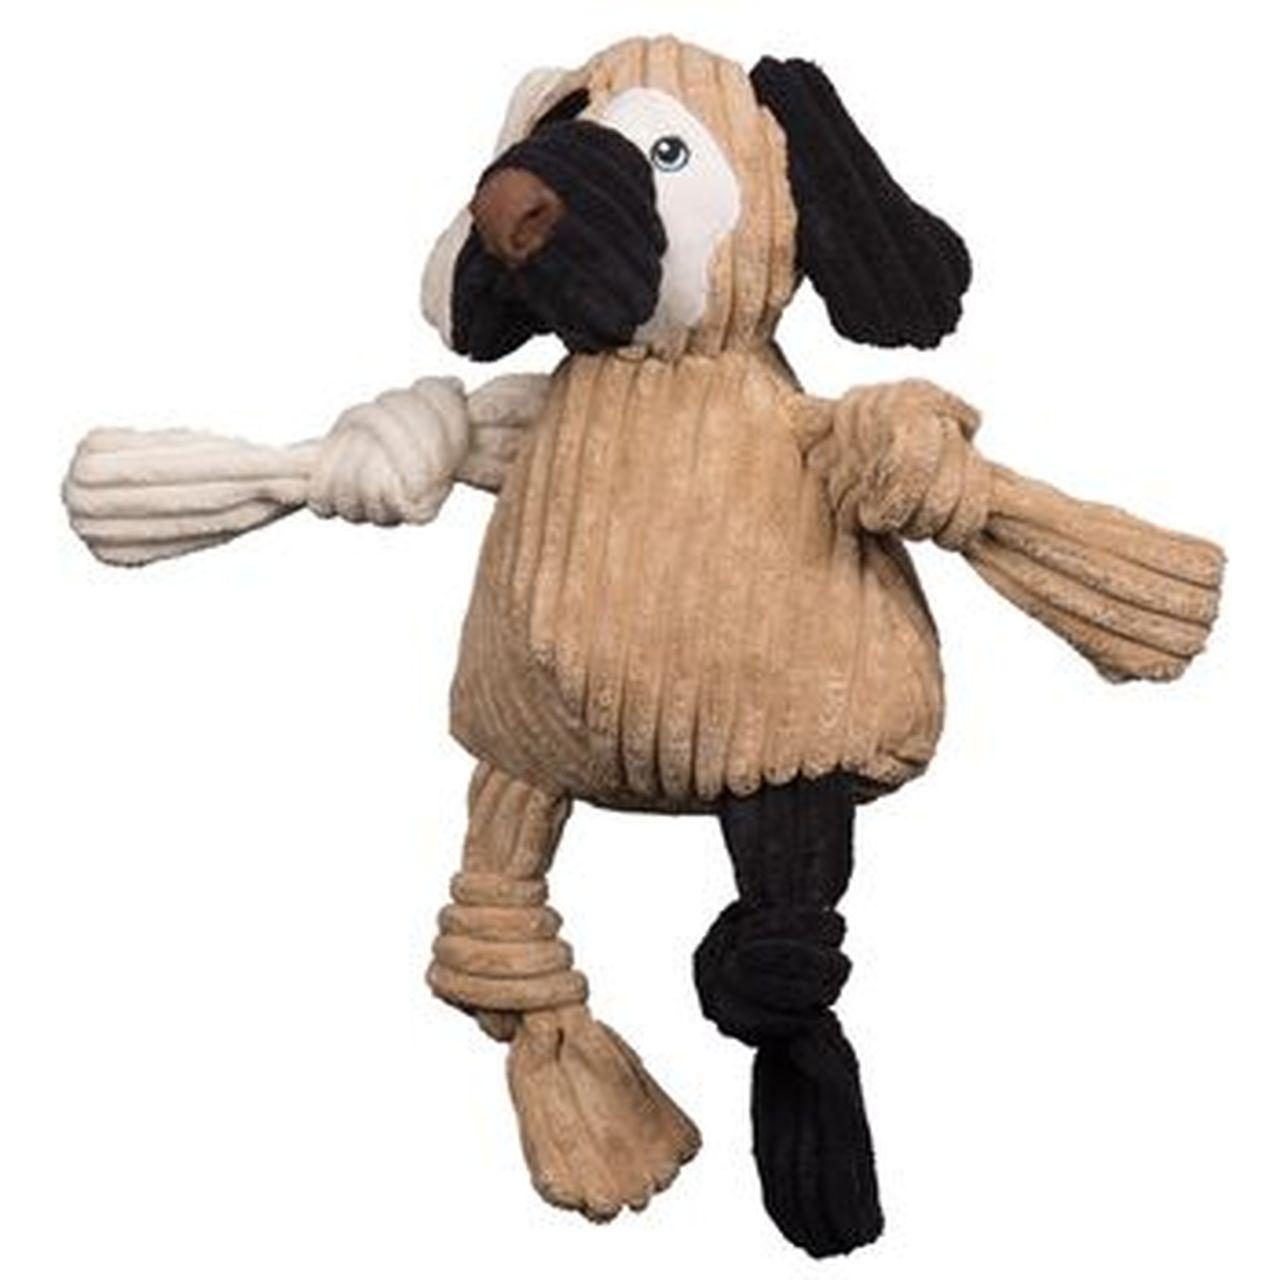 HuggleHounds Knottie HuggleMutt Patches Dog Toy, Large